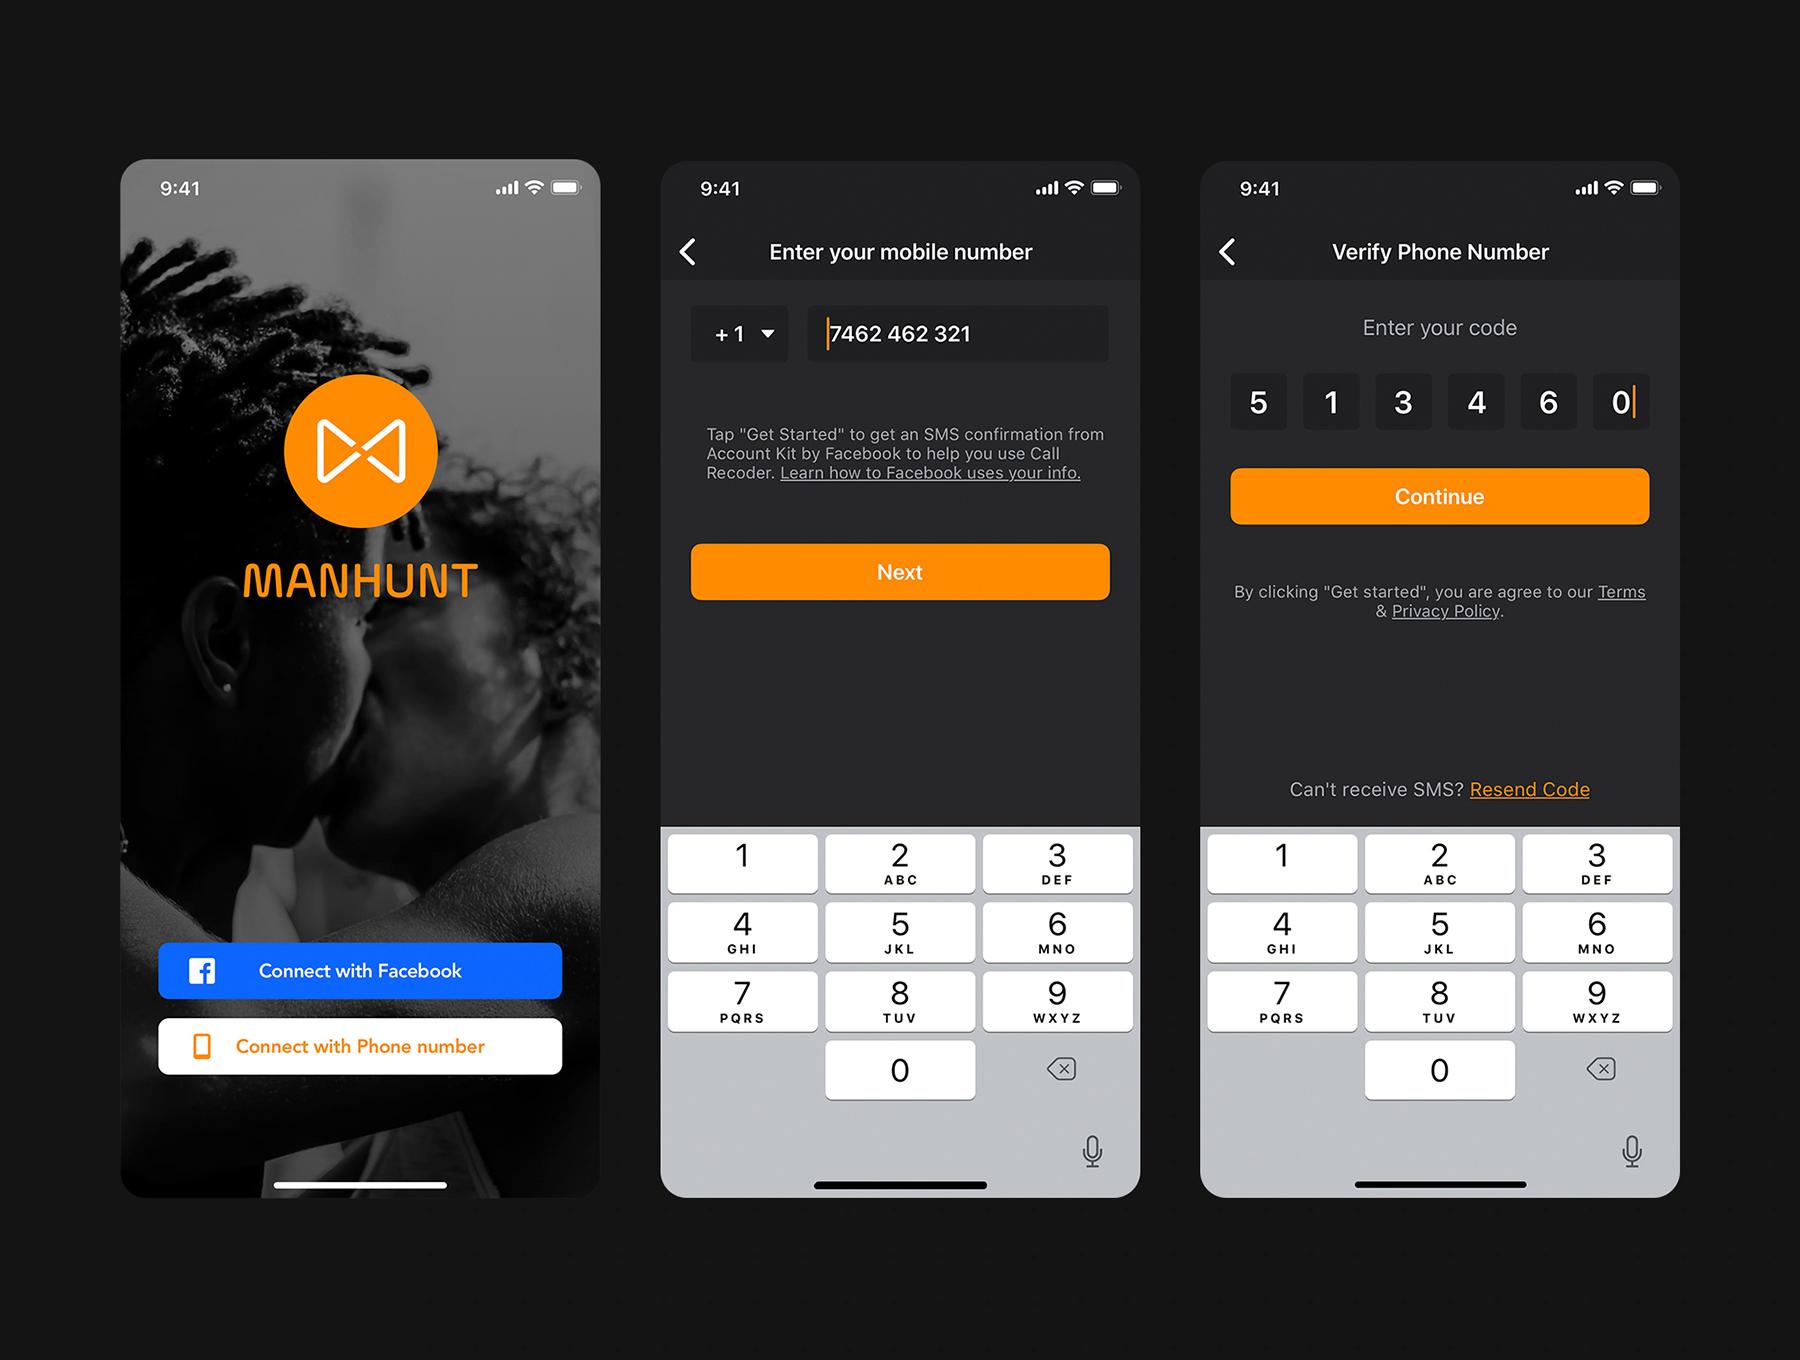 男士风格的约会交友app设计iOS Ui模板套装下载[Sketch,XD,fig] ManHunt Dating app UI Kit